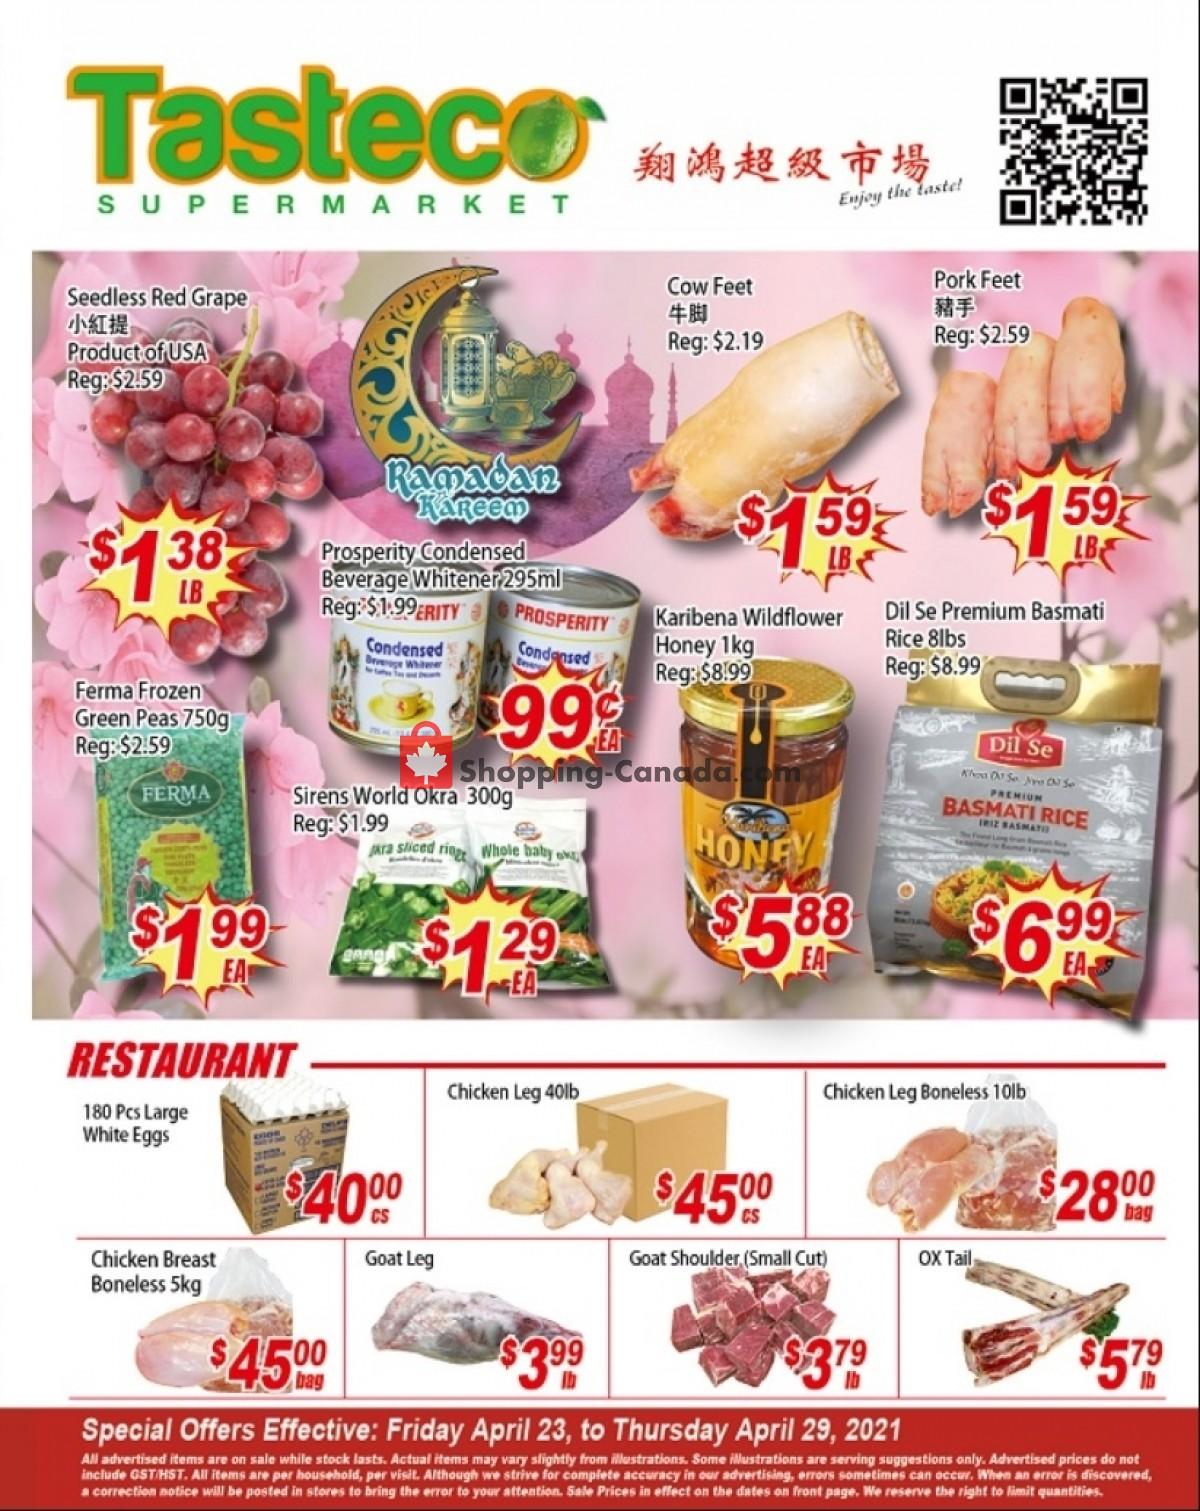 Flyer Tasteco Supermarket Canada - from Friday April 23, 2021 to Thursday April 29, 2021